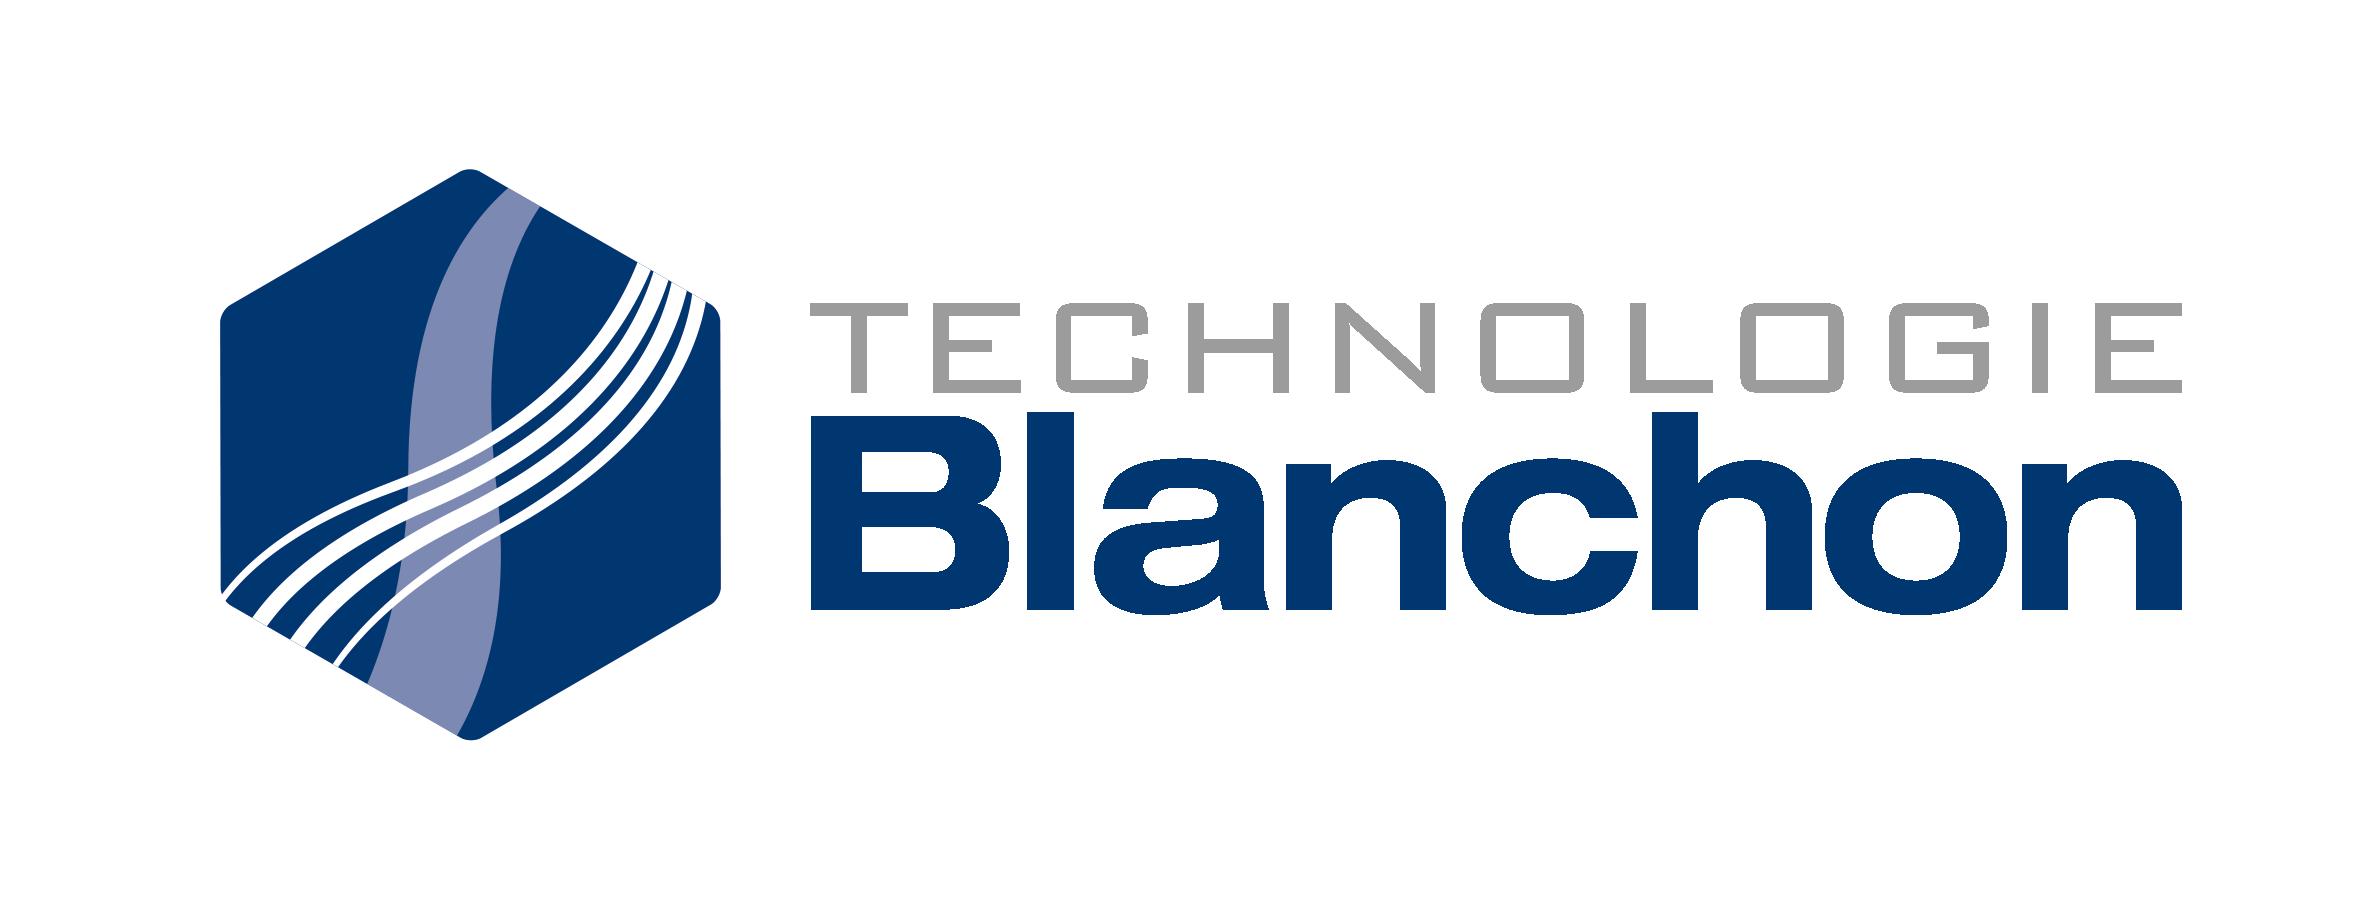 Technologie Blanchon